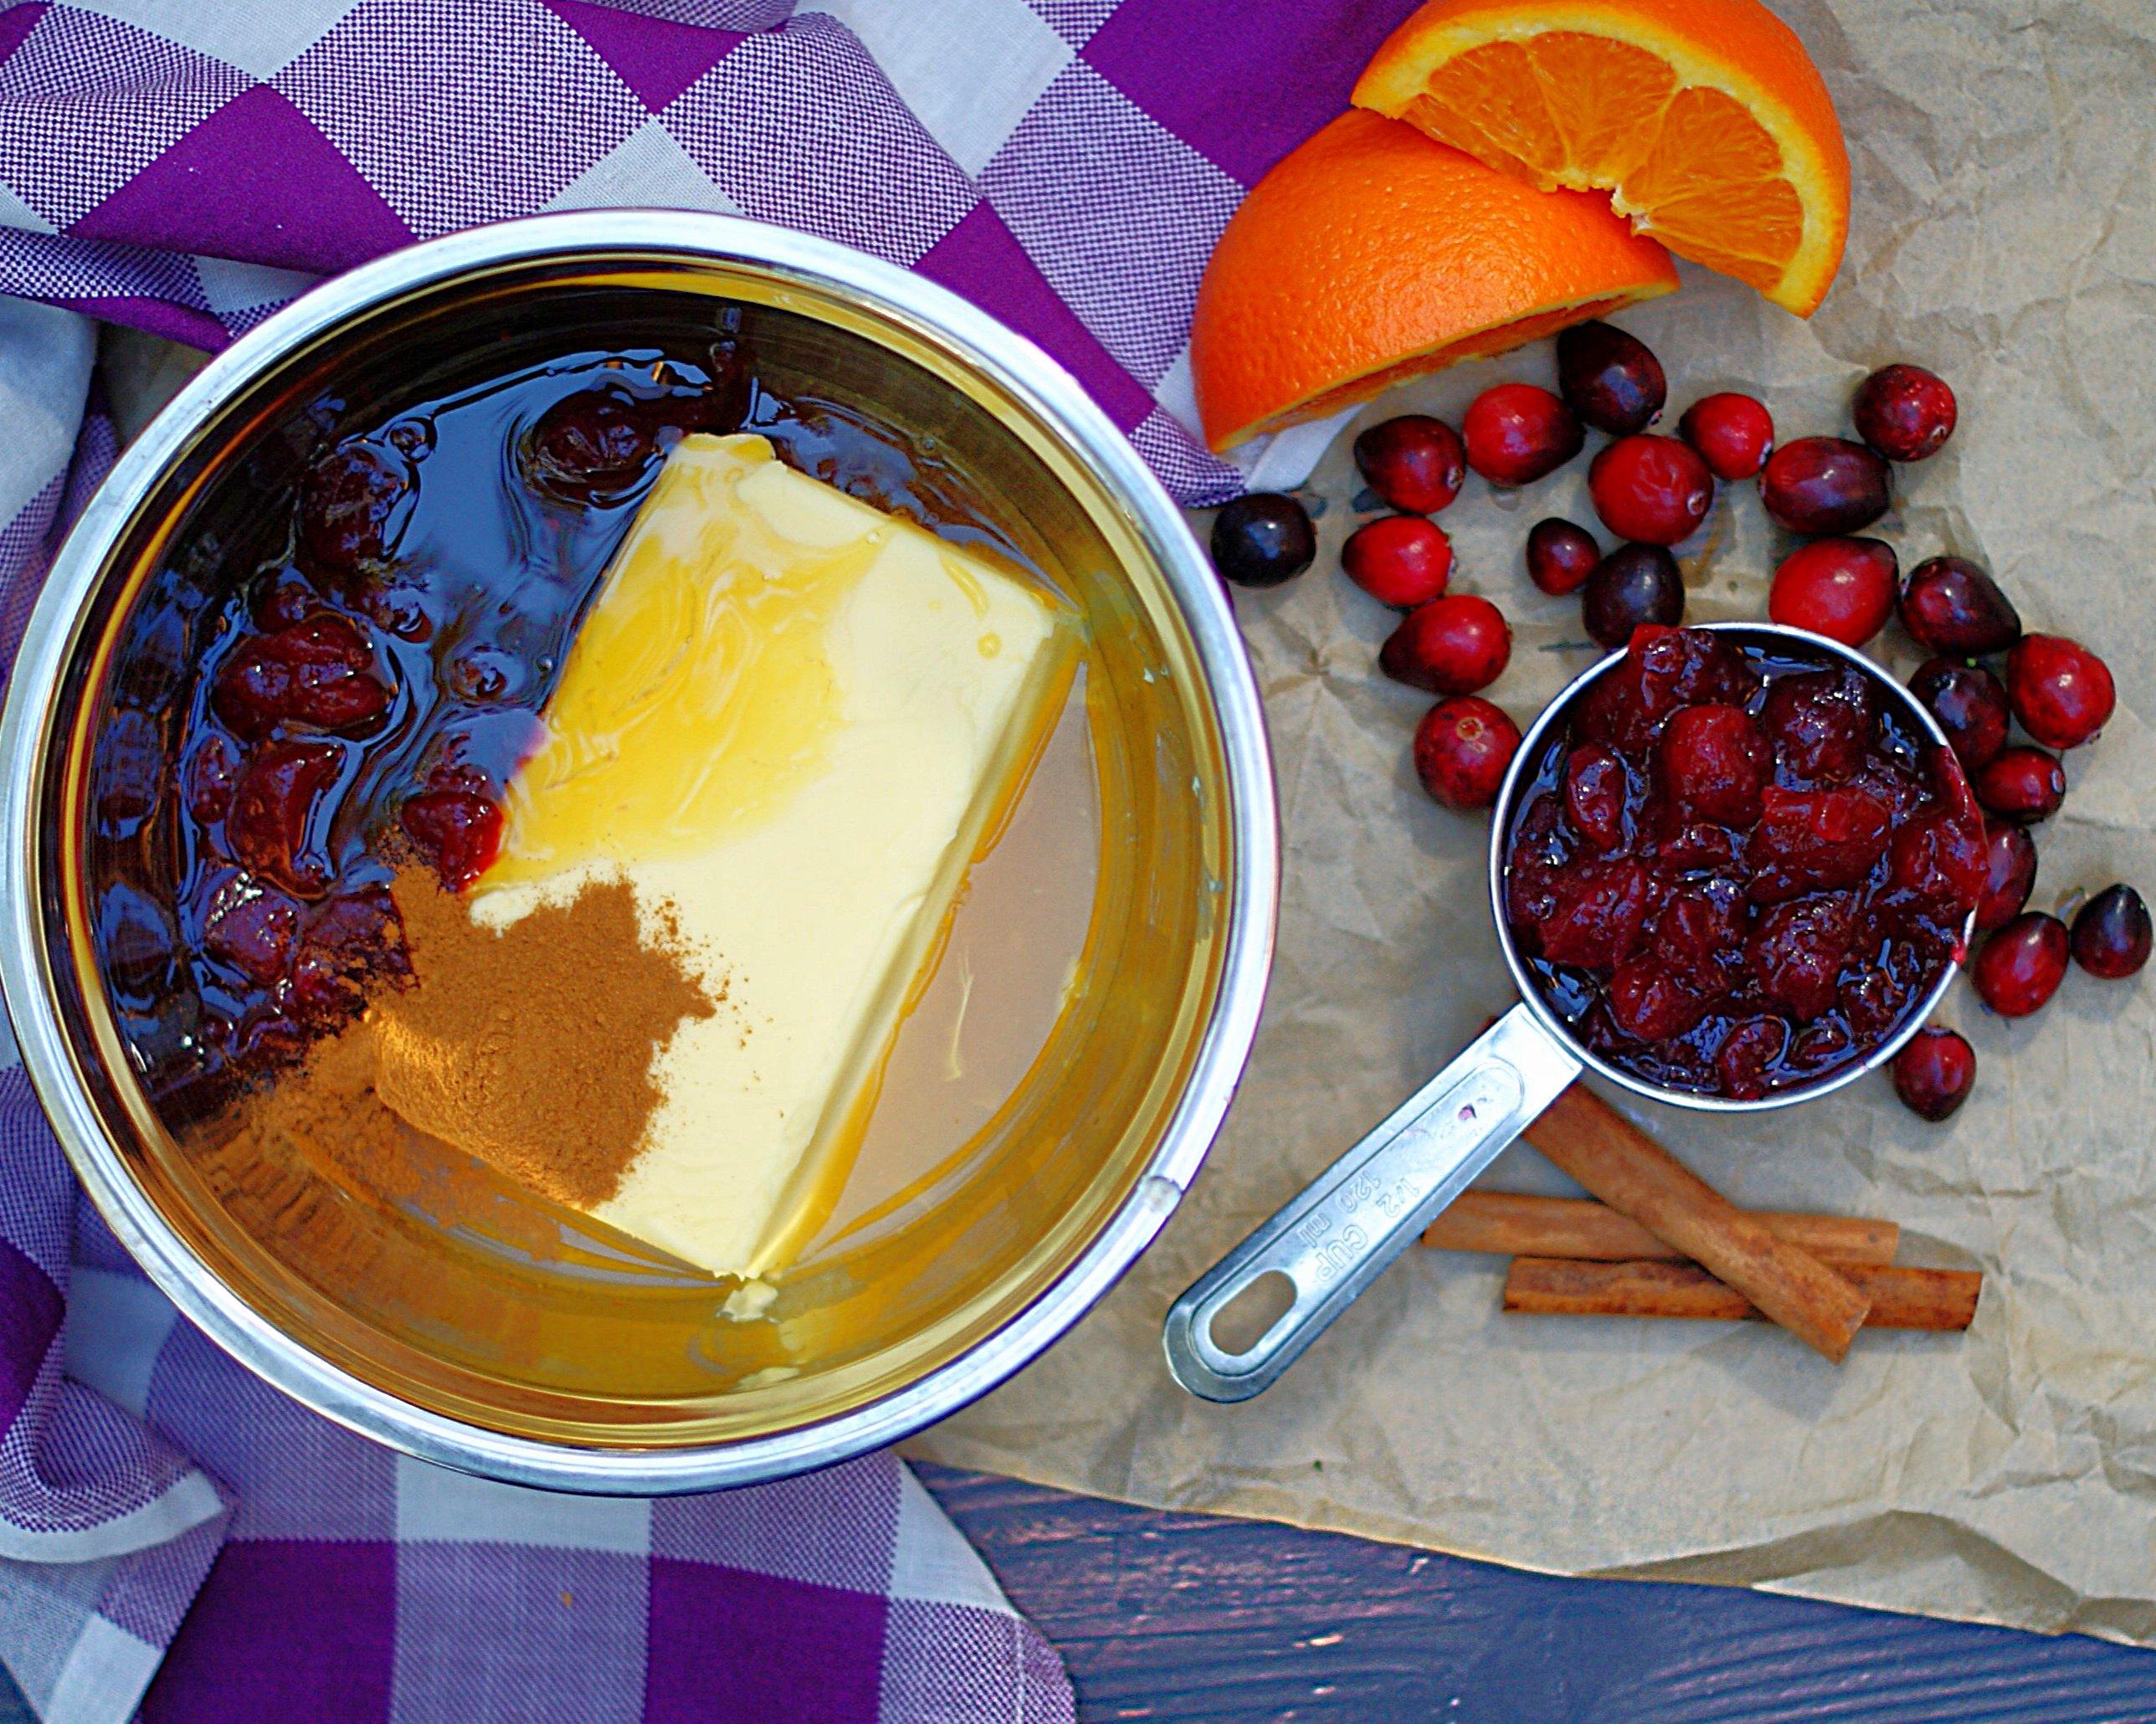 Cranberry Orange Butter ingredients